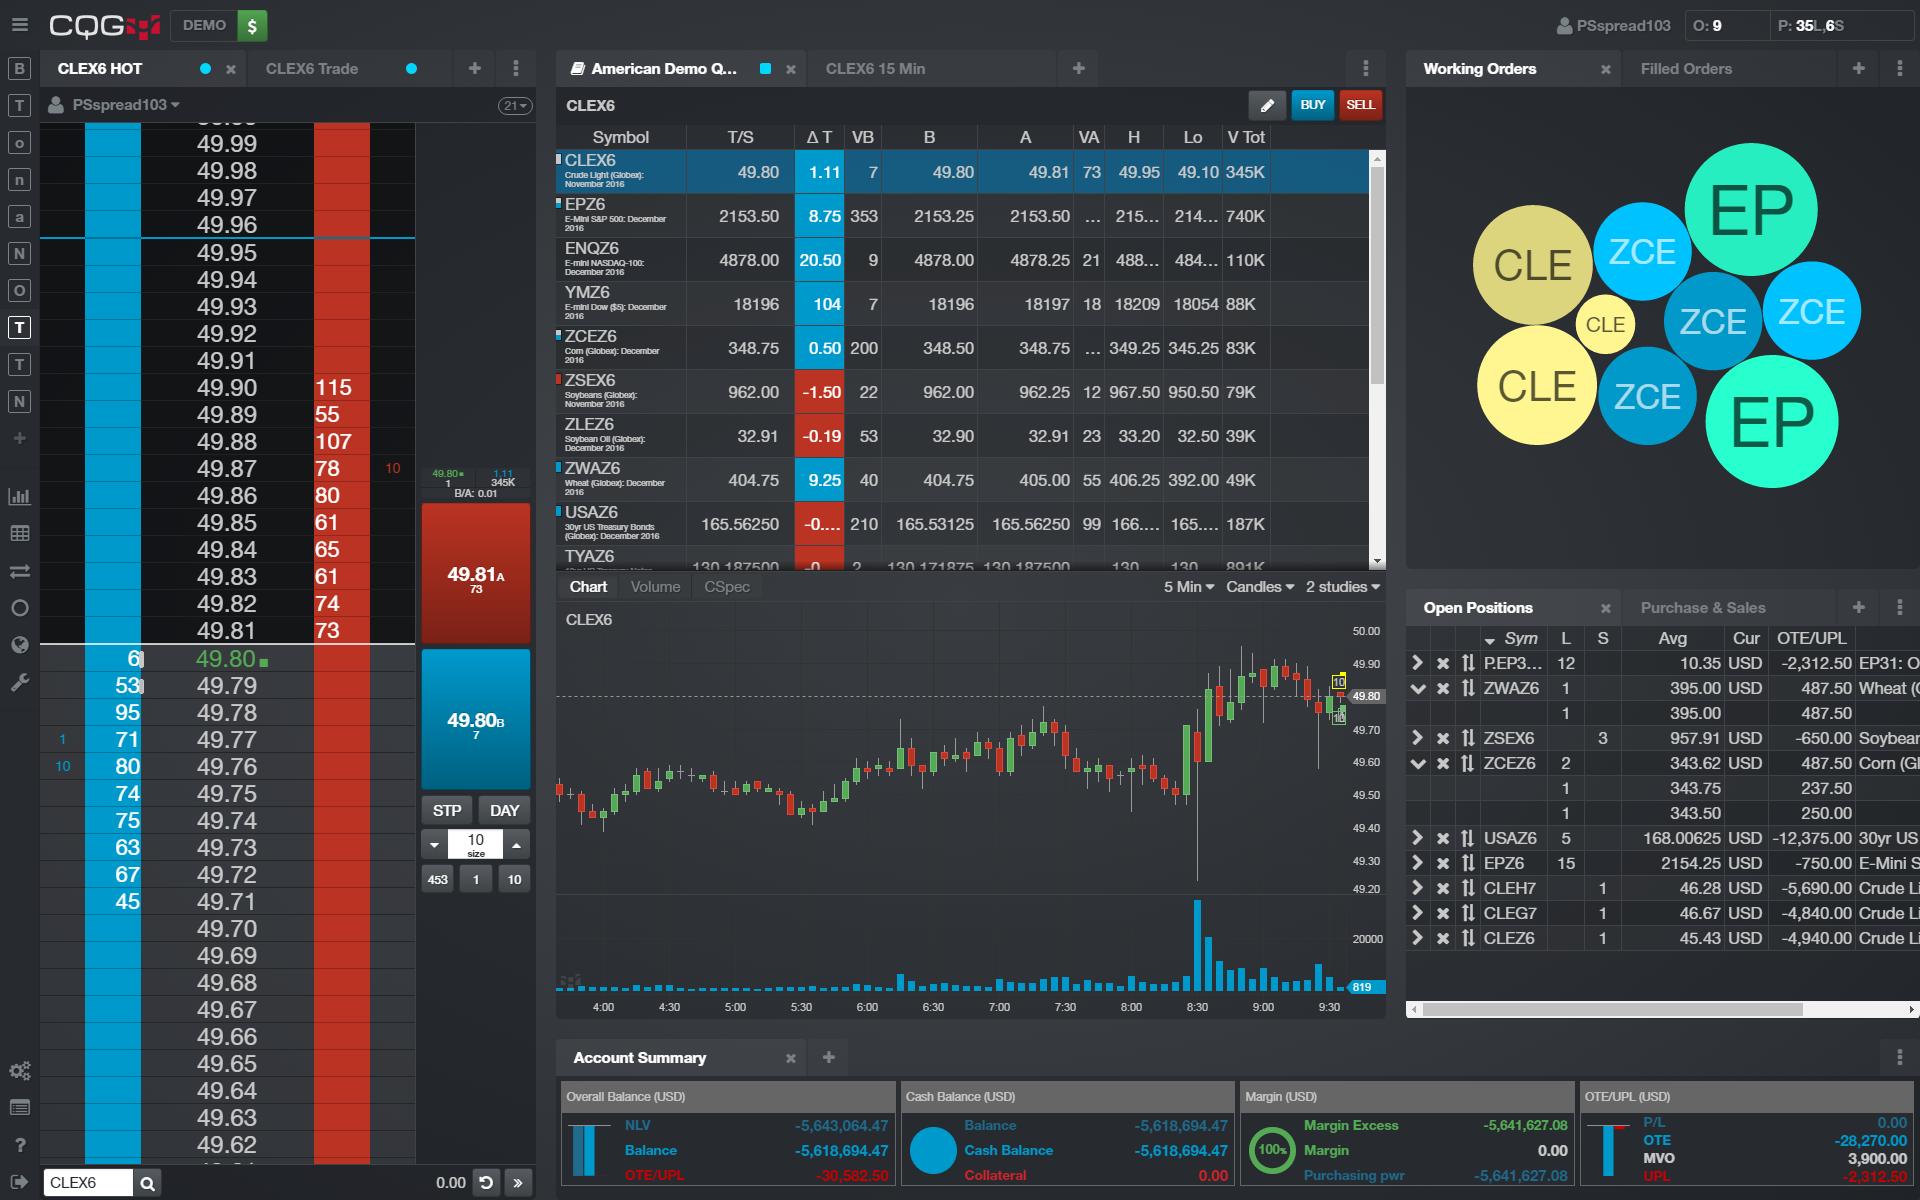 CQG Trader | CQG, Inc.